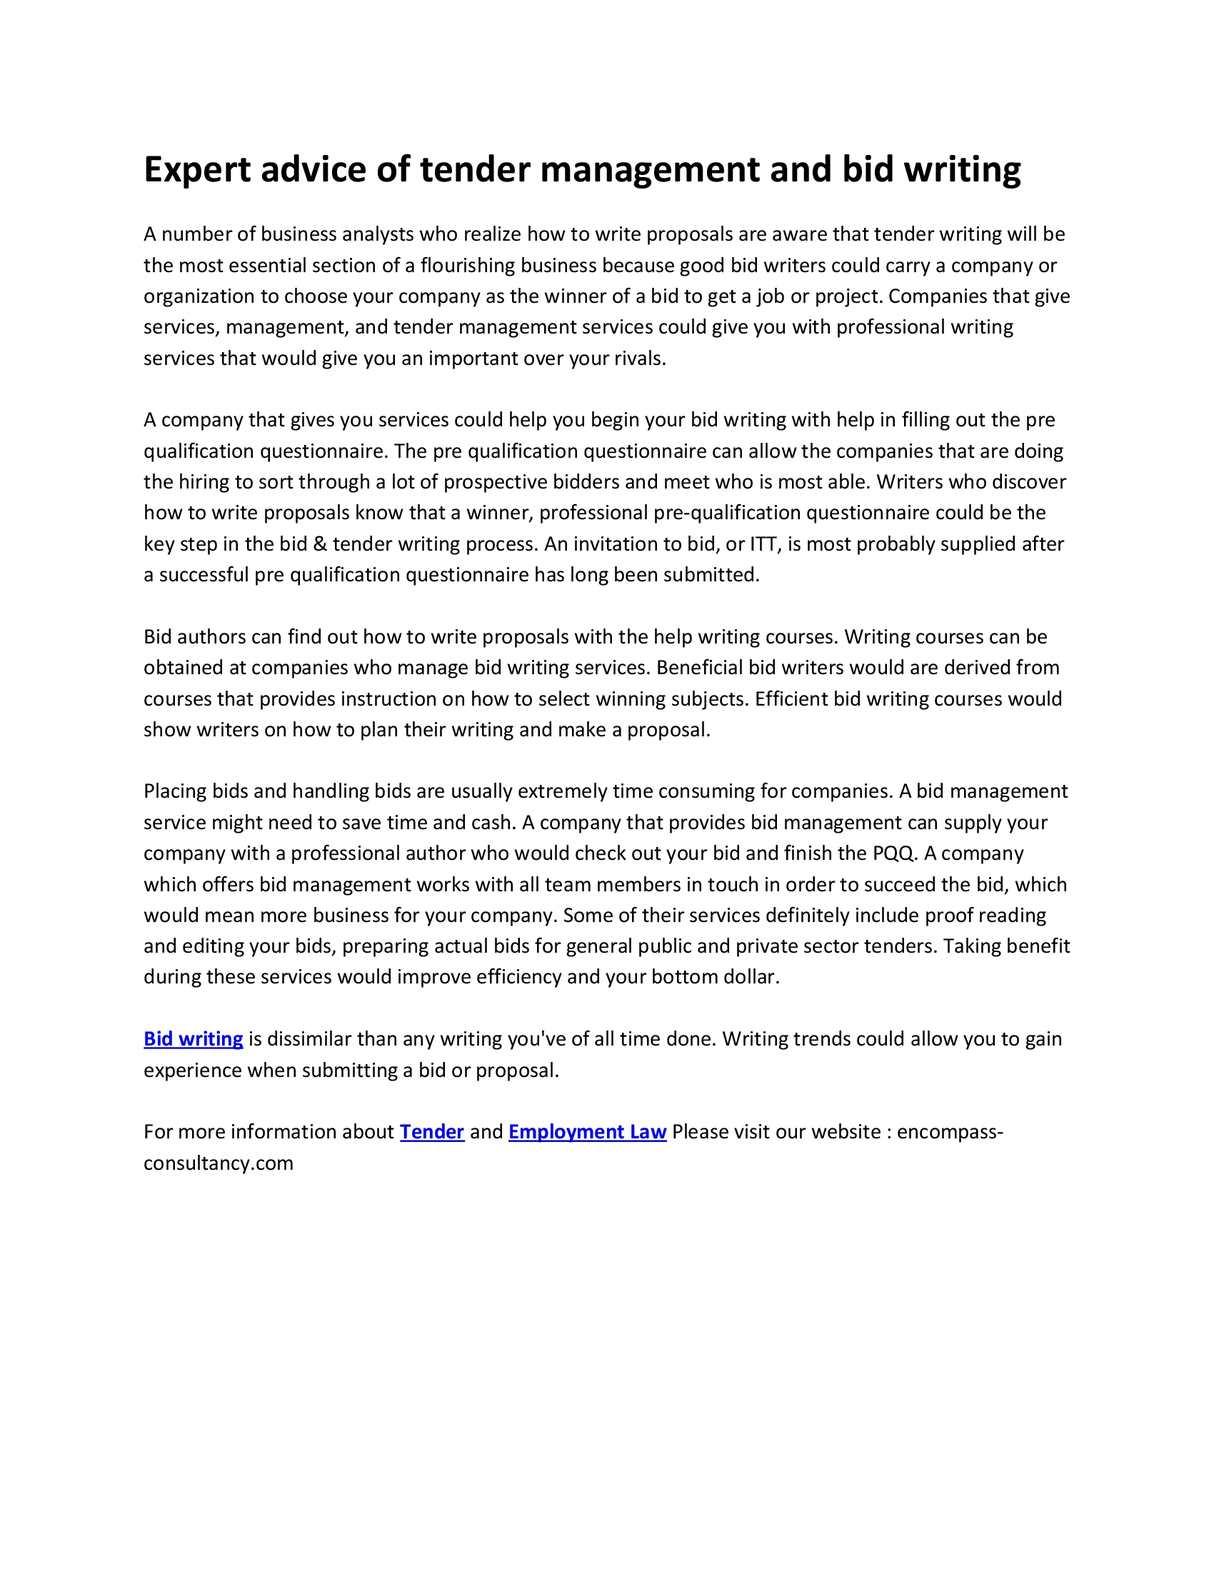 bid writing services